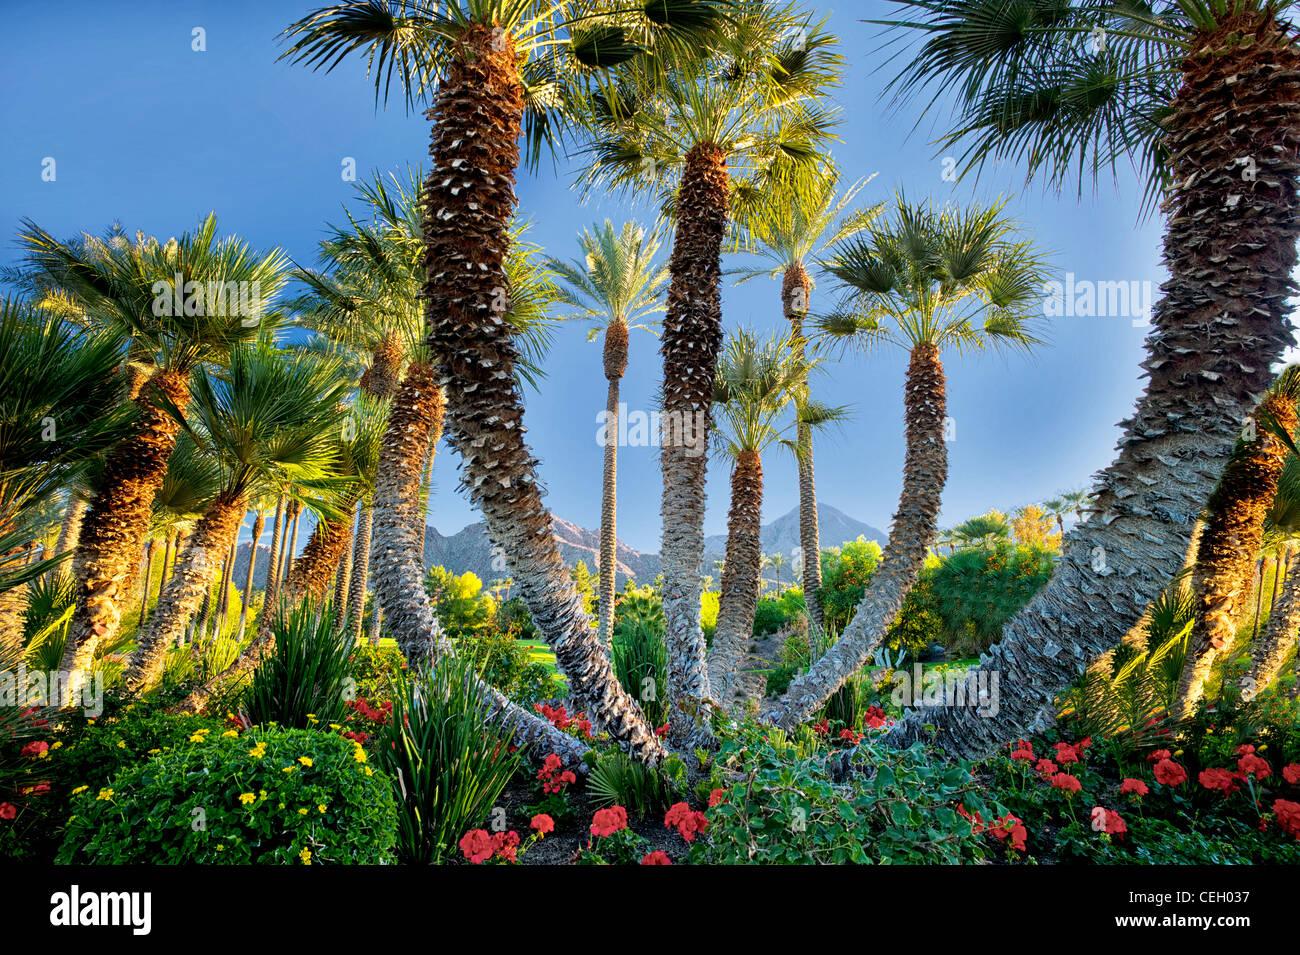 Charming Palm Trees In Garden. Palm Desert, California